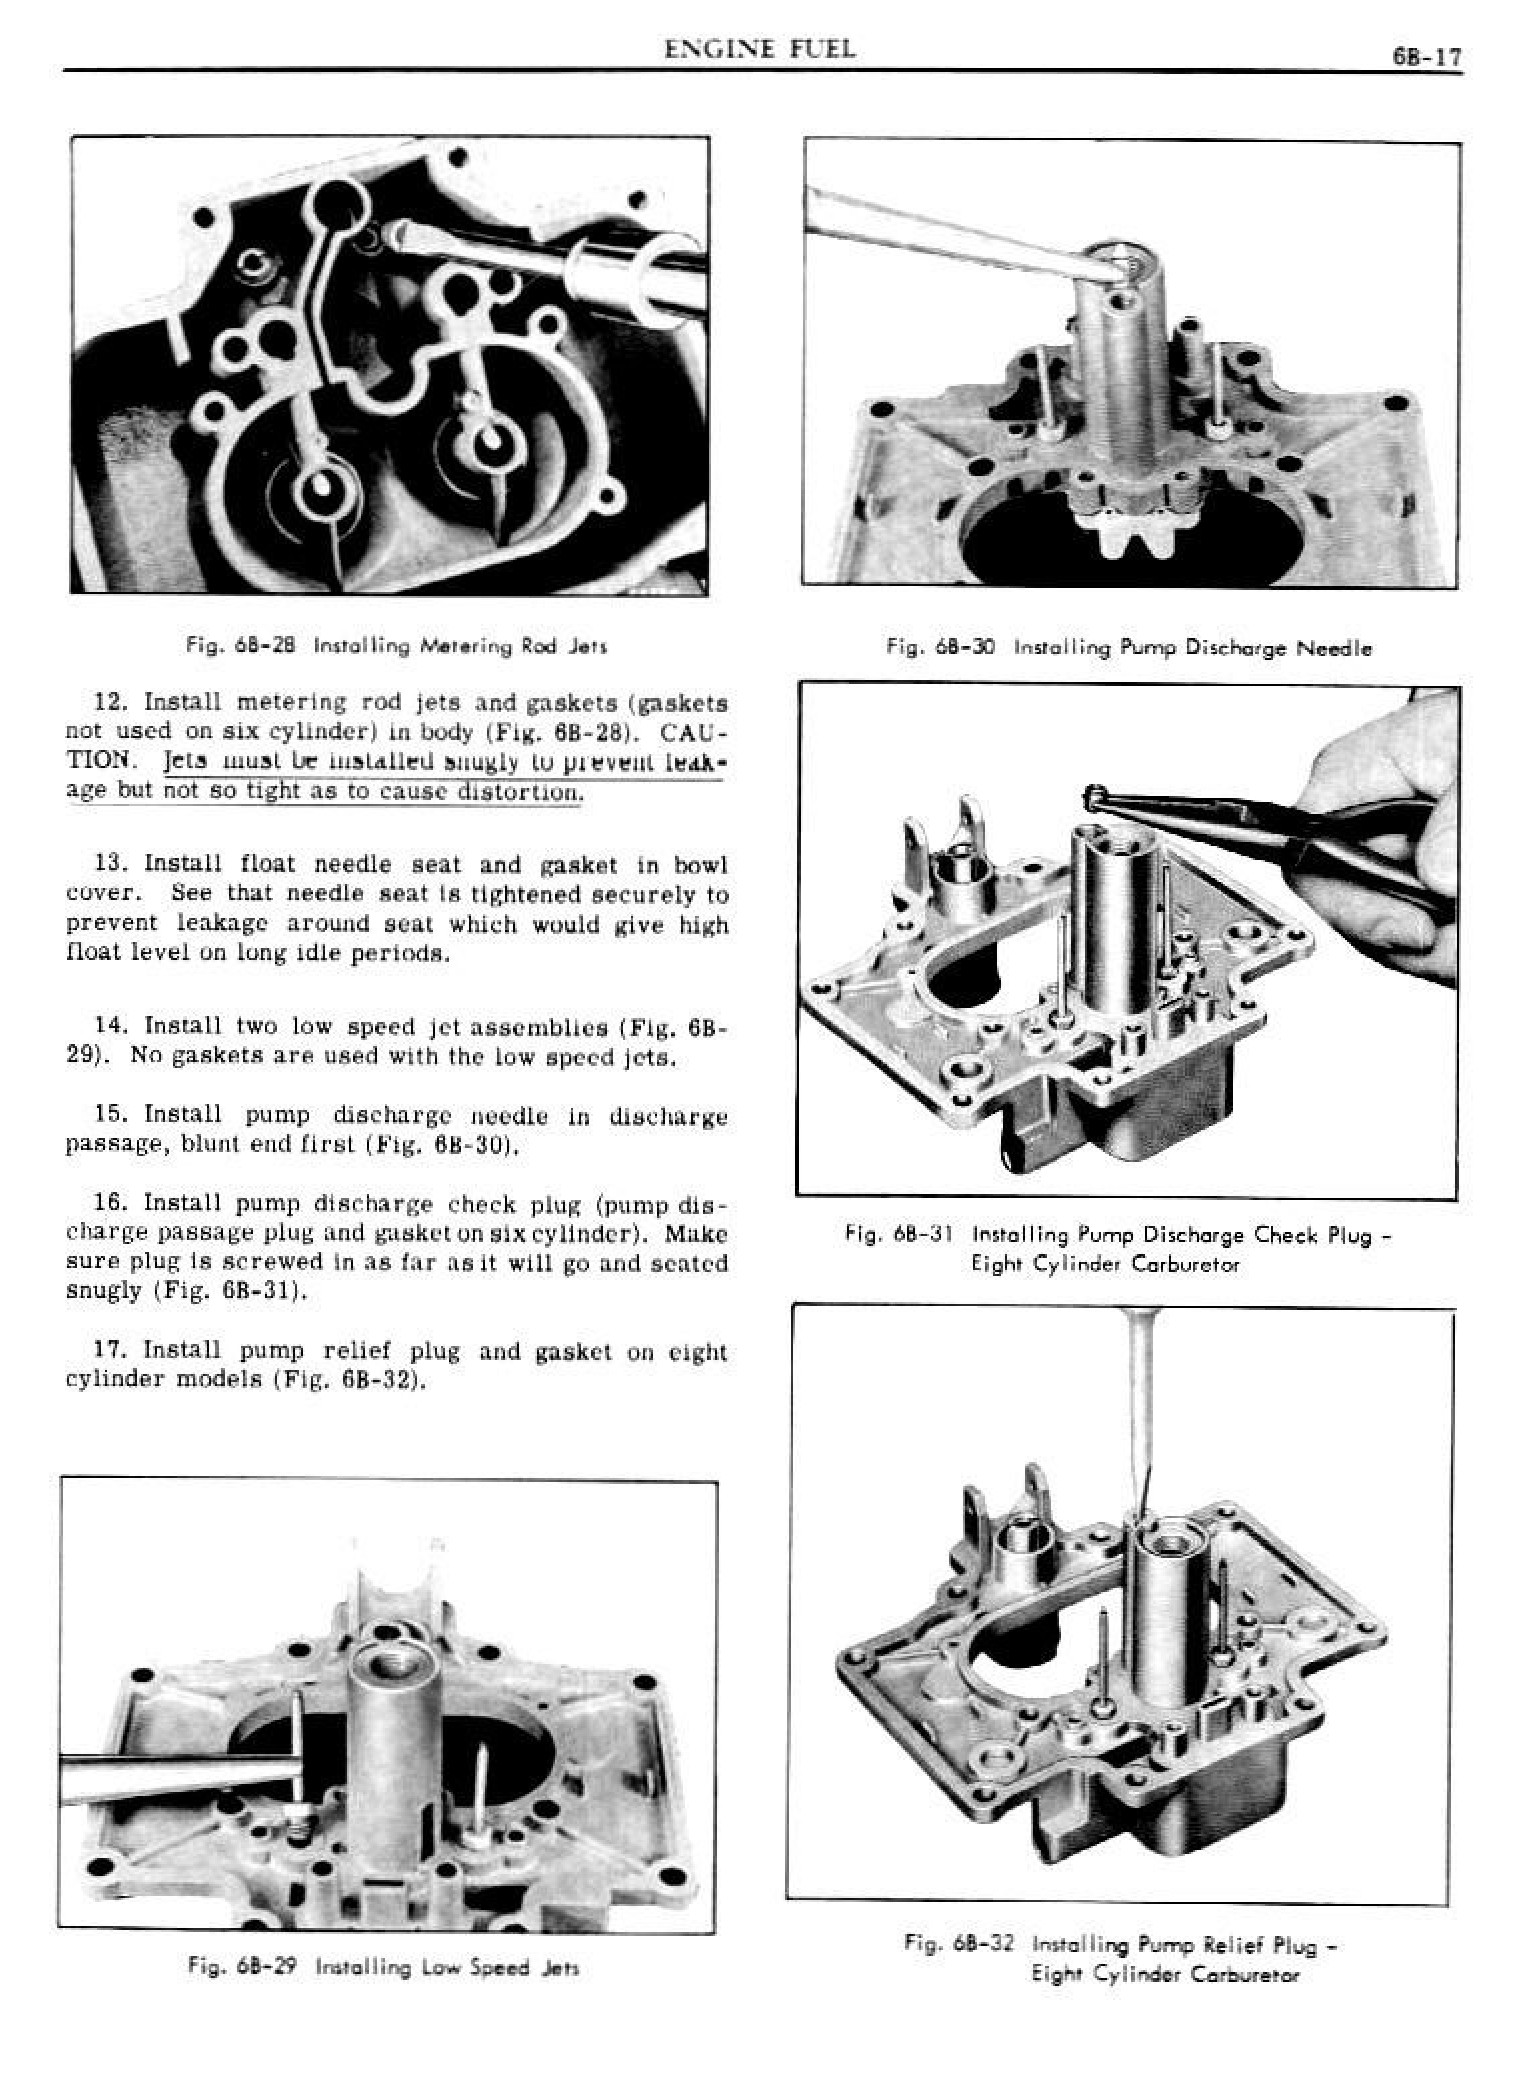 1949 Pontiac Shop Manual- Engine Fuel Page 17 of 42